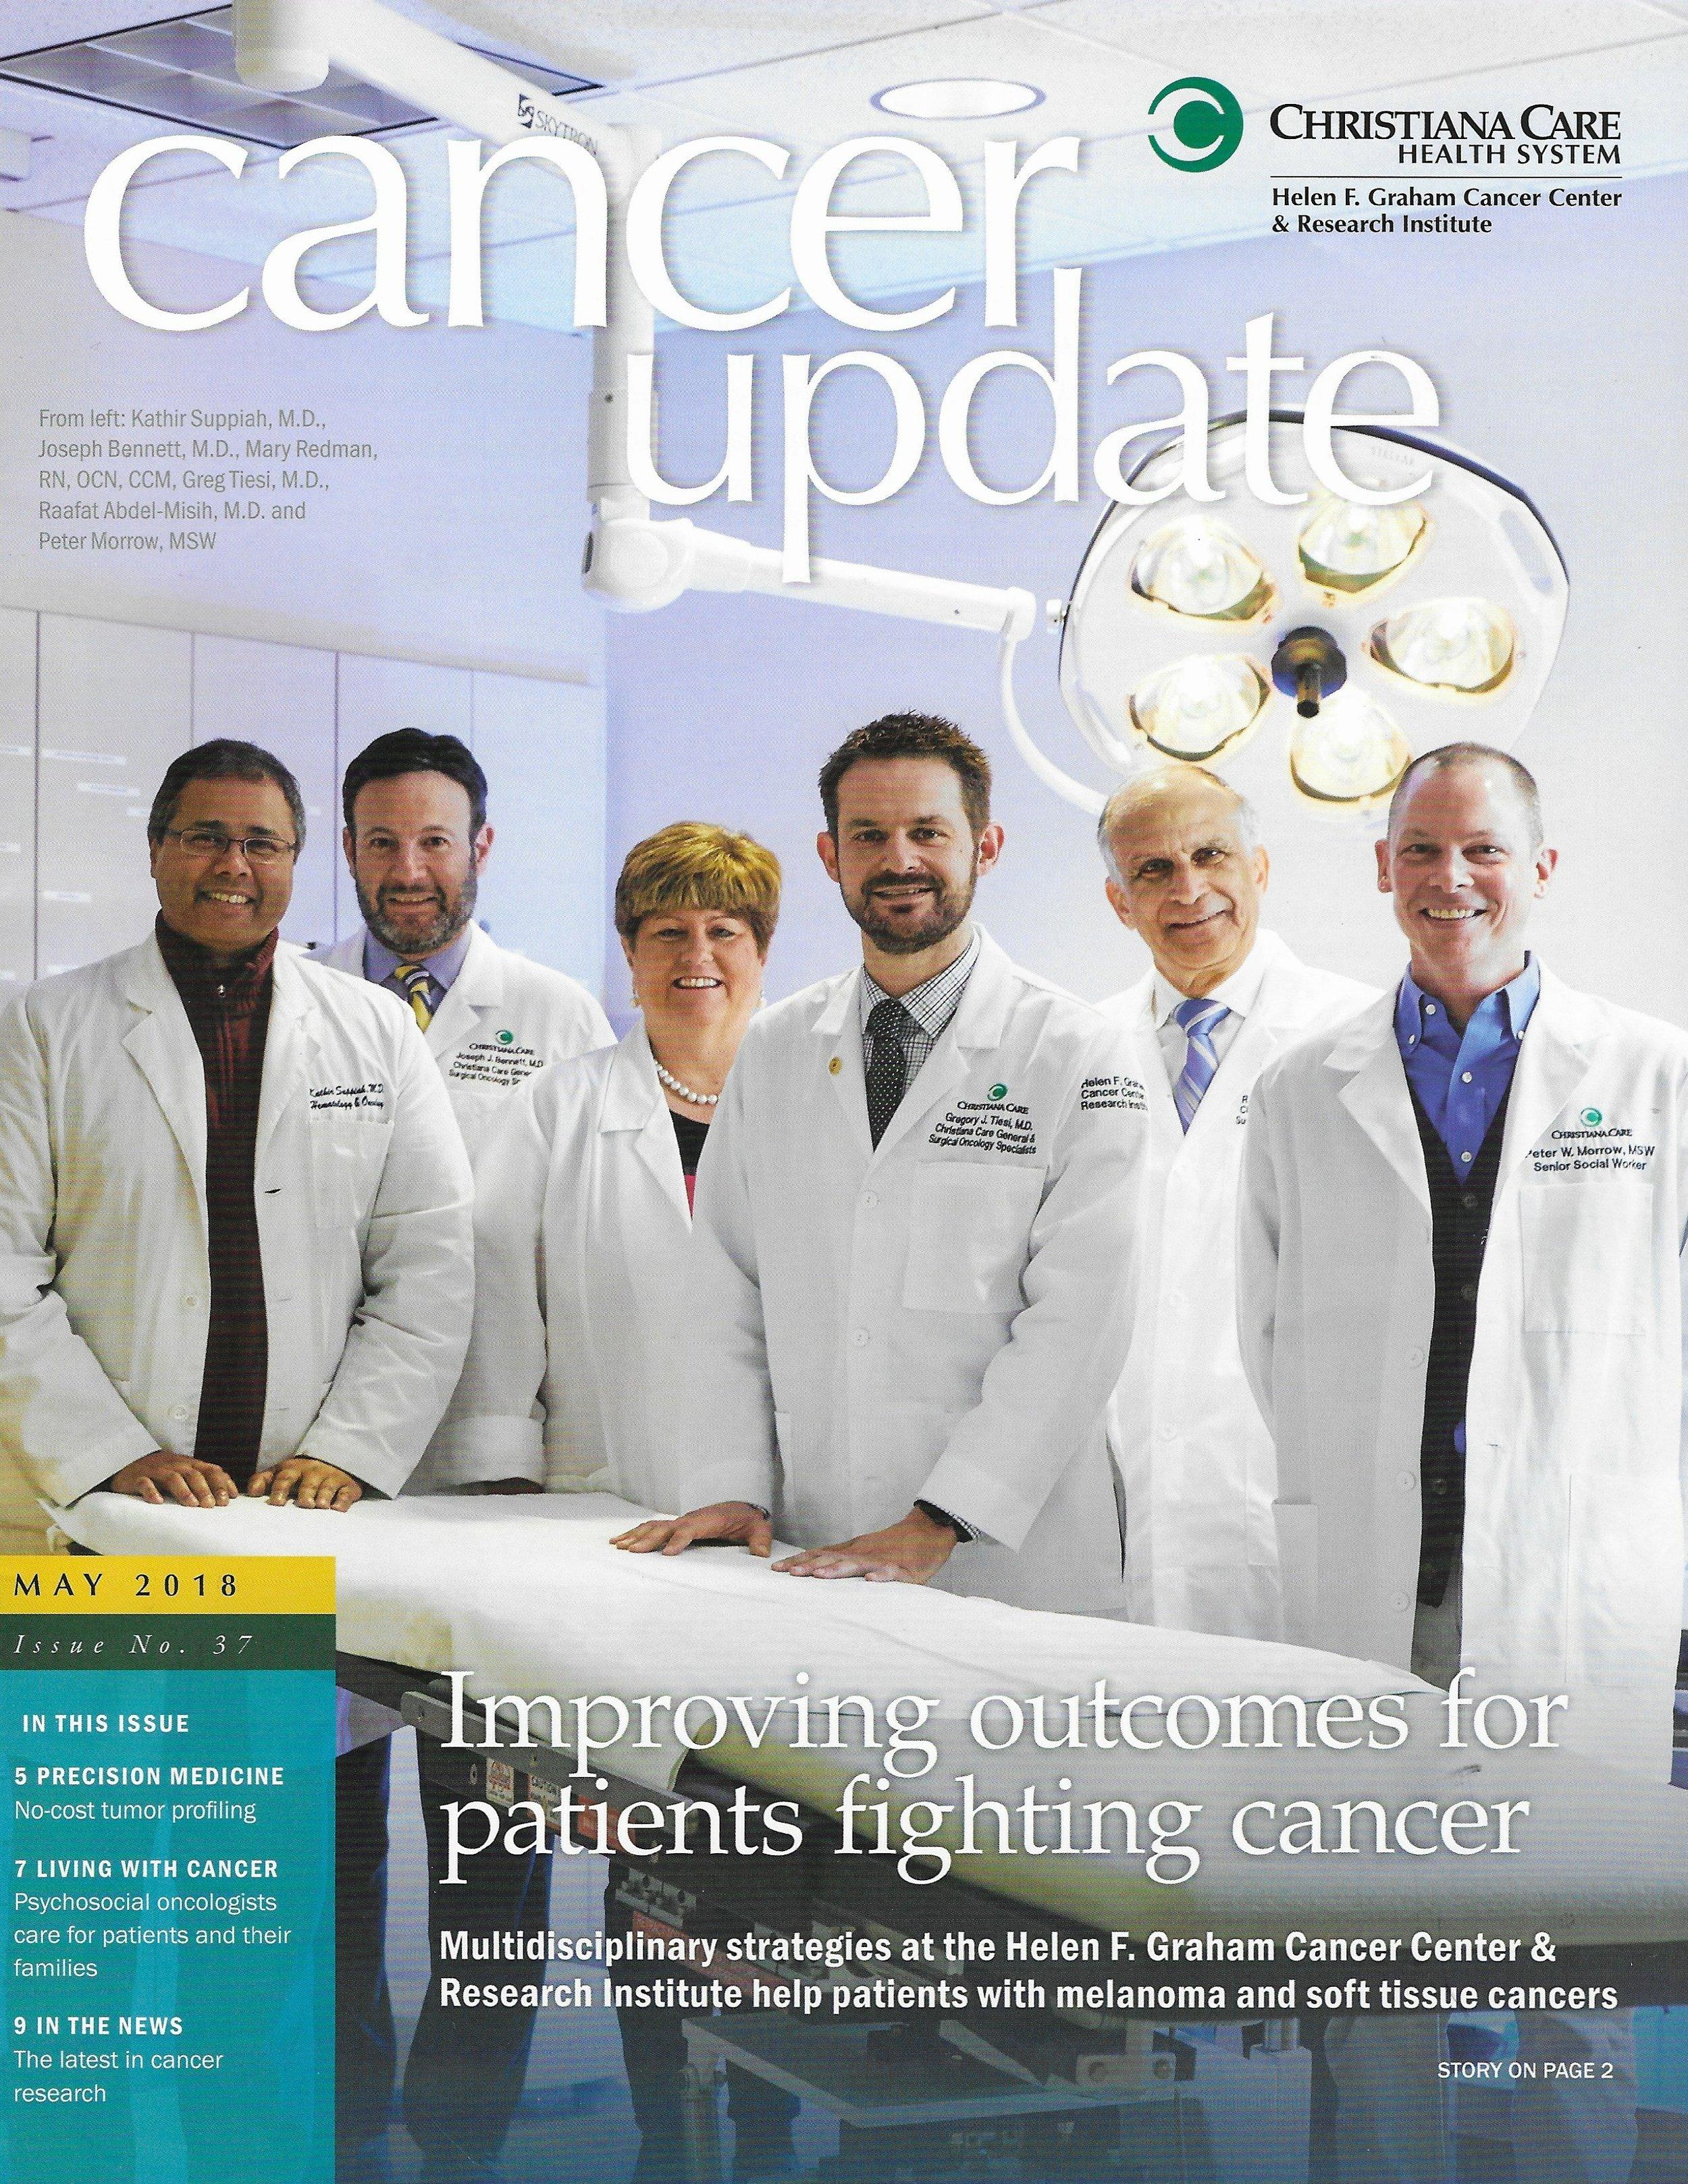 cancerupdatecover.jpg